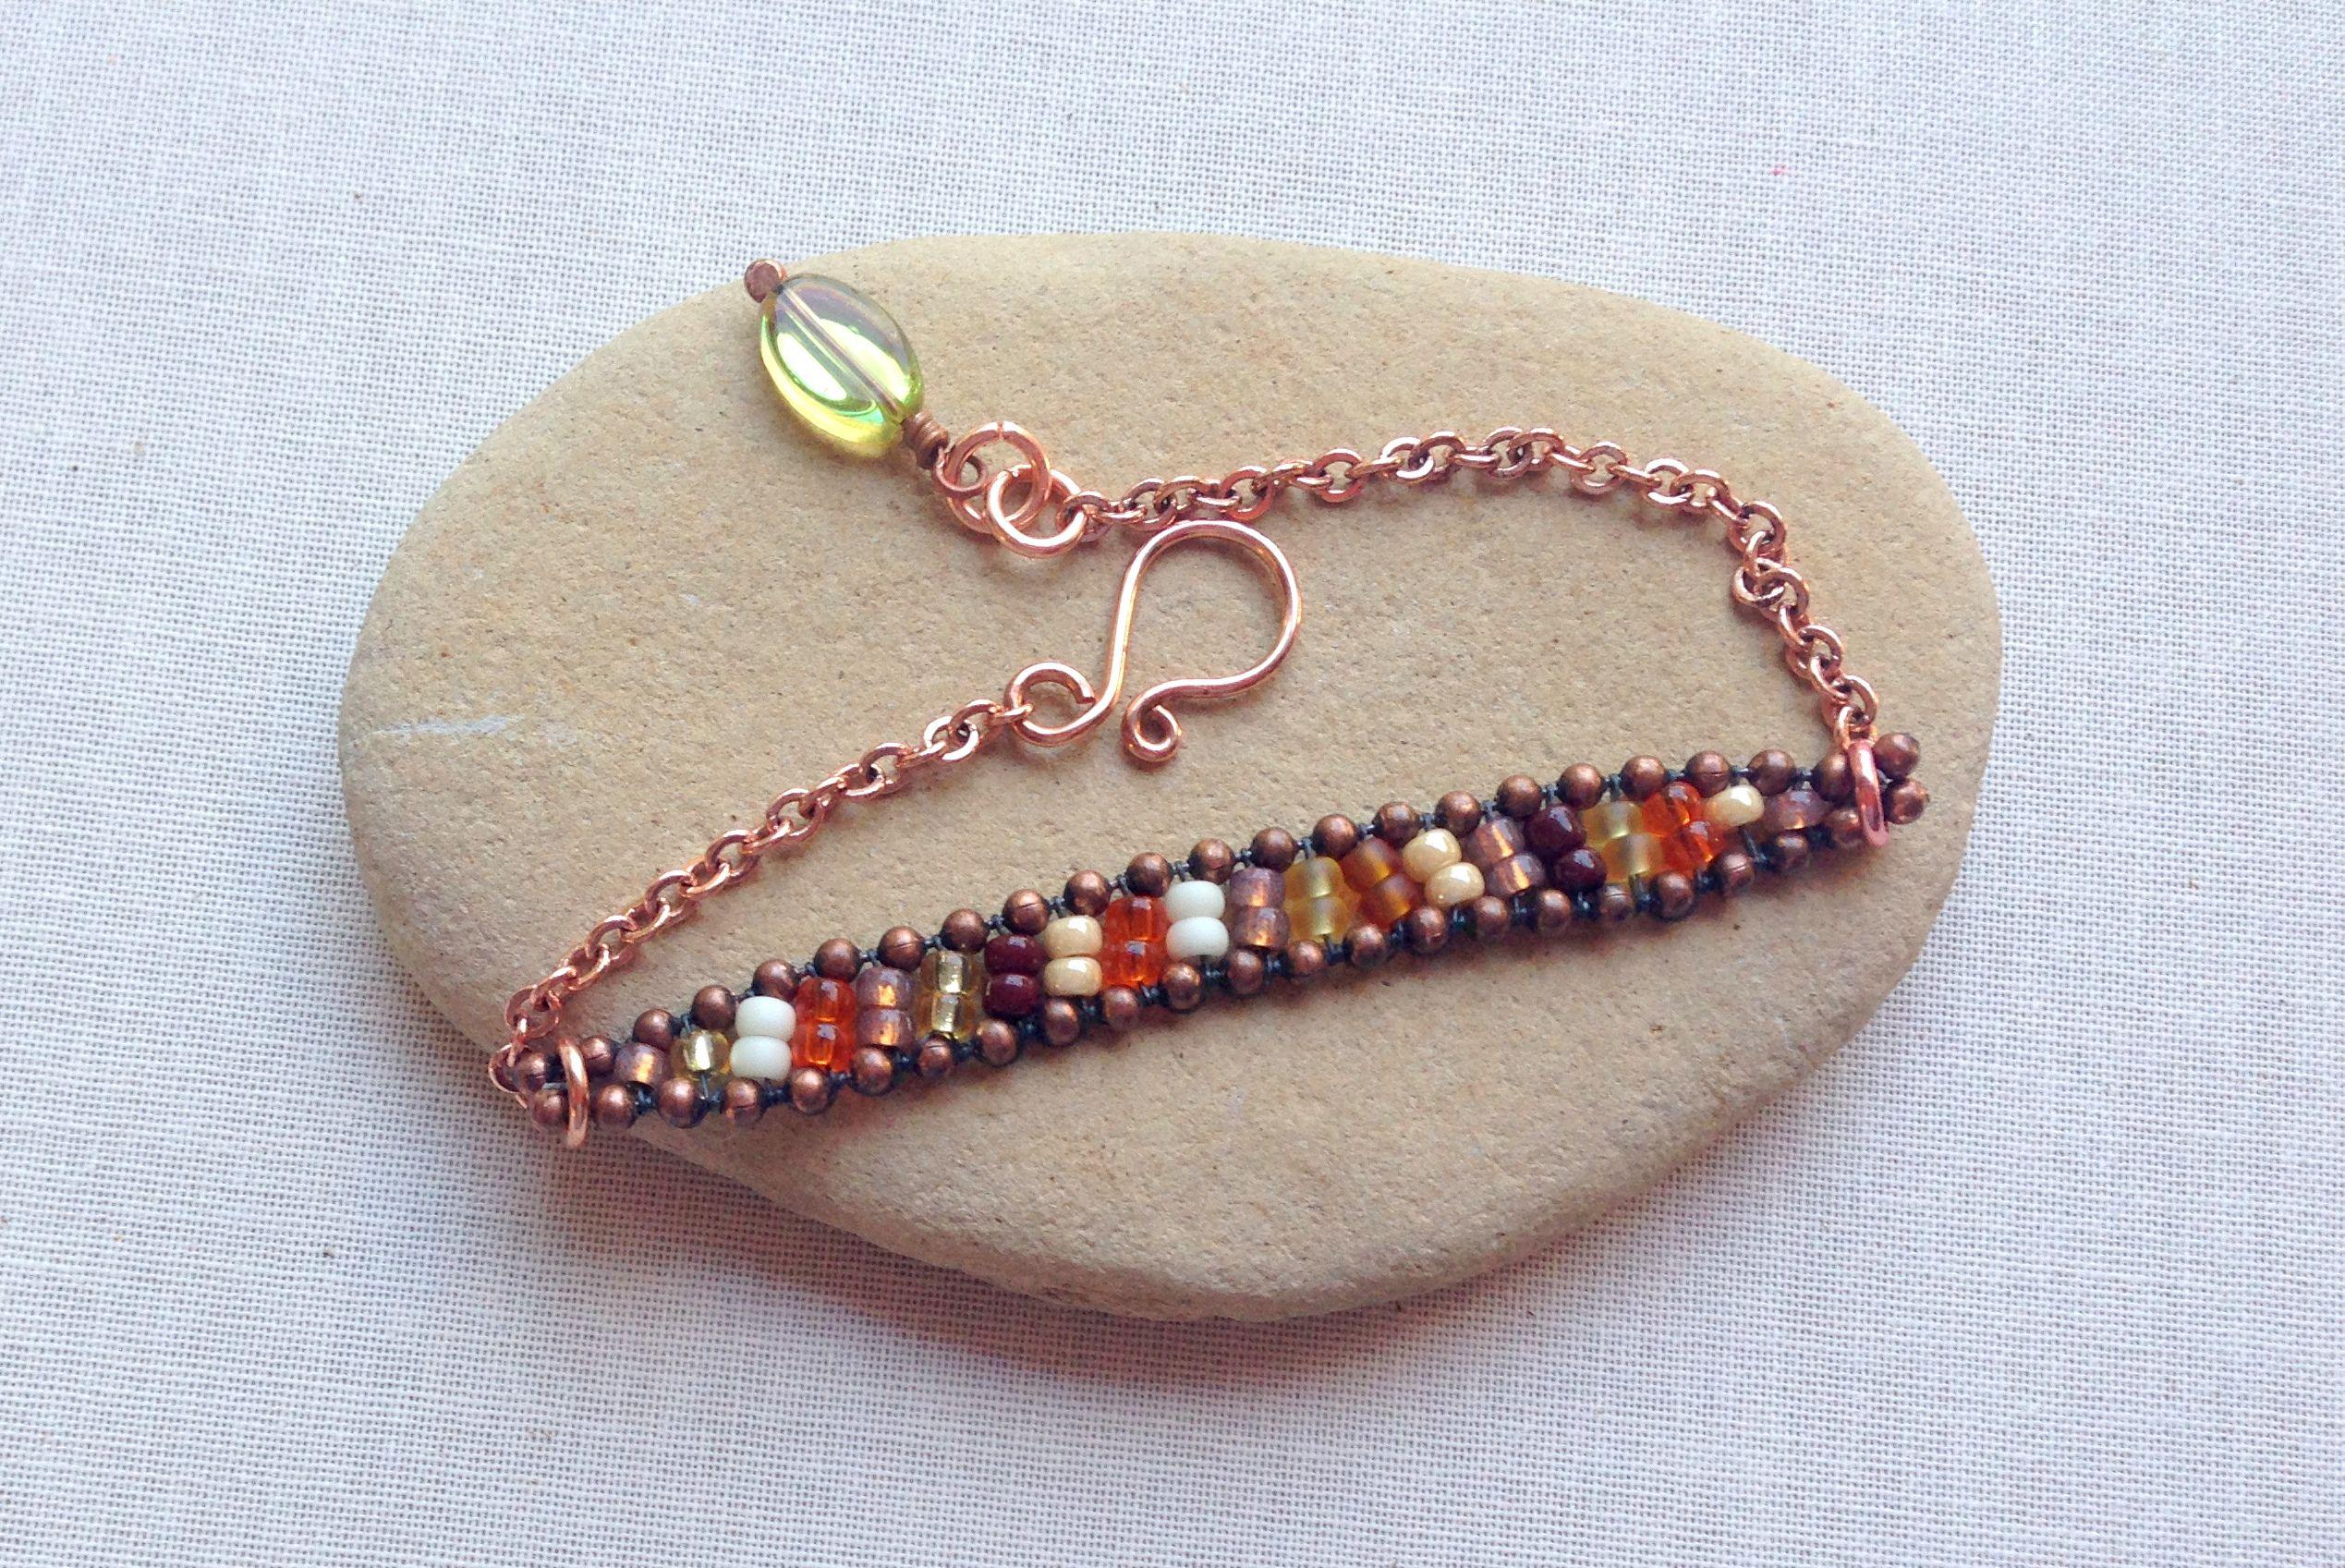 A ball chain bead weave bracelet